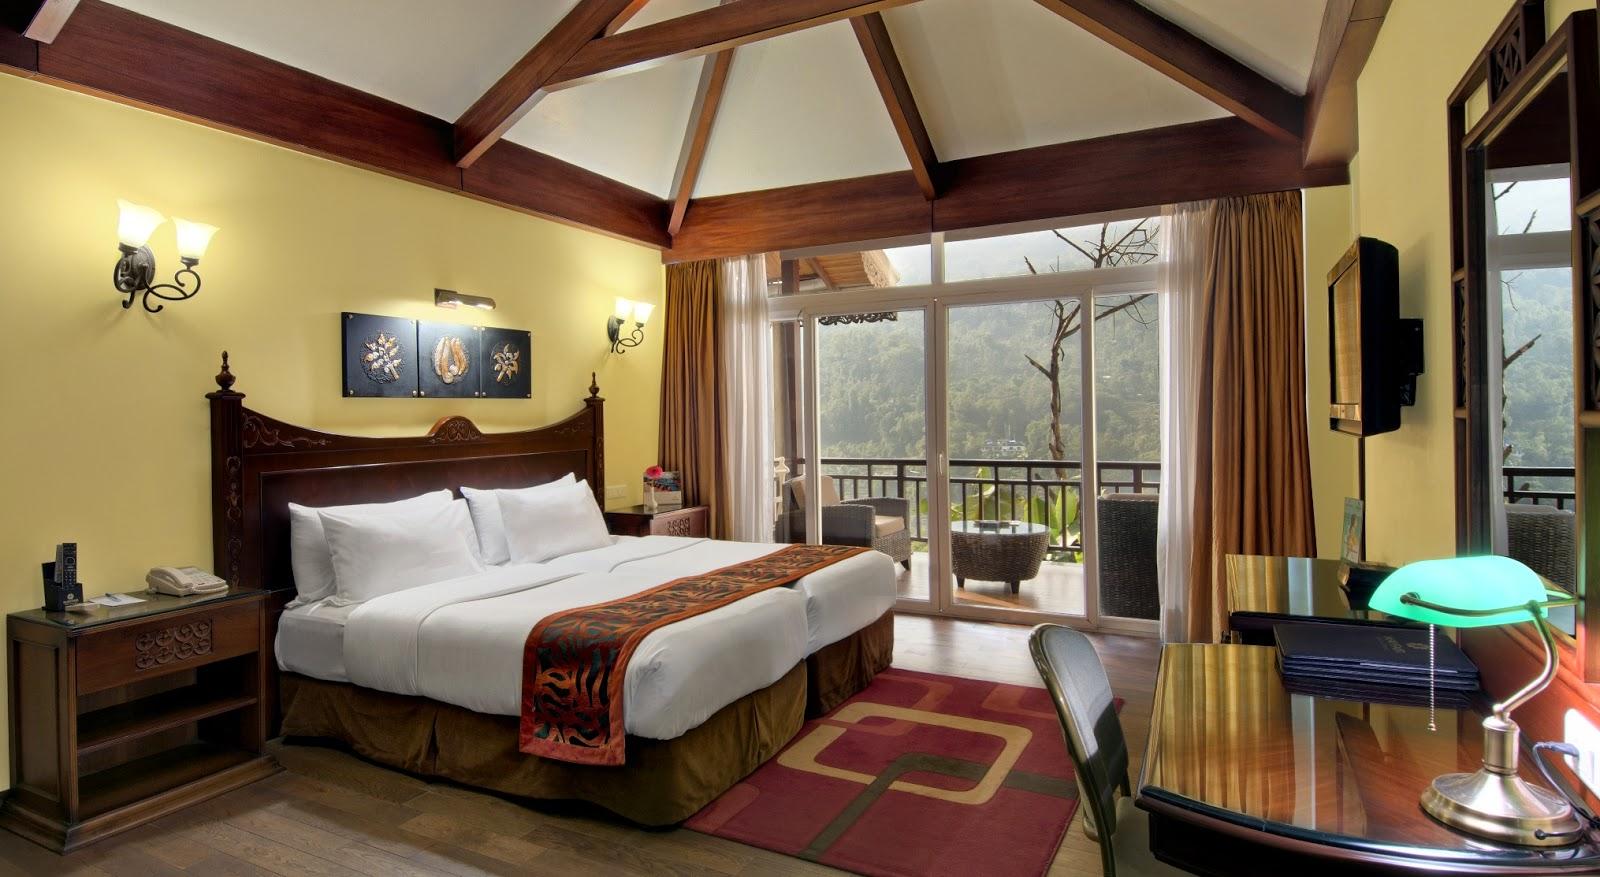 Boutique Hotel In Gangtok Stay In Mayfair Spa Resort Amp Casino